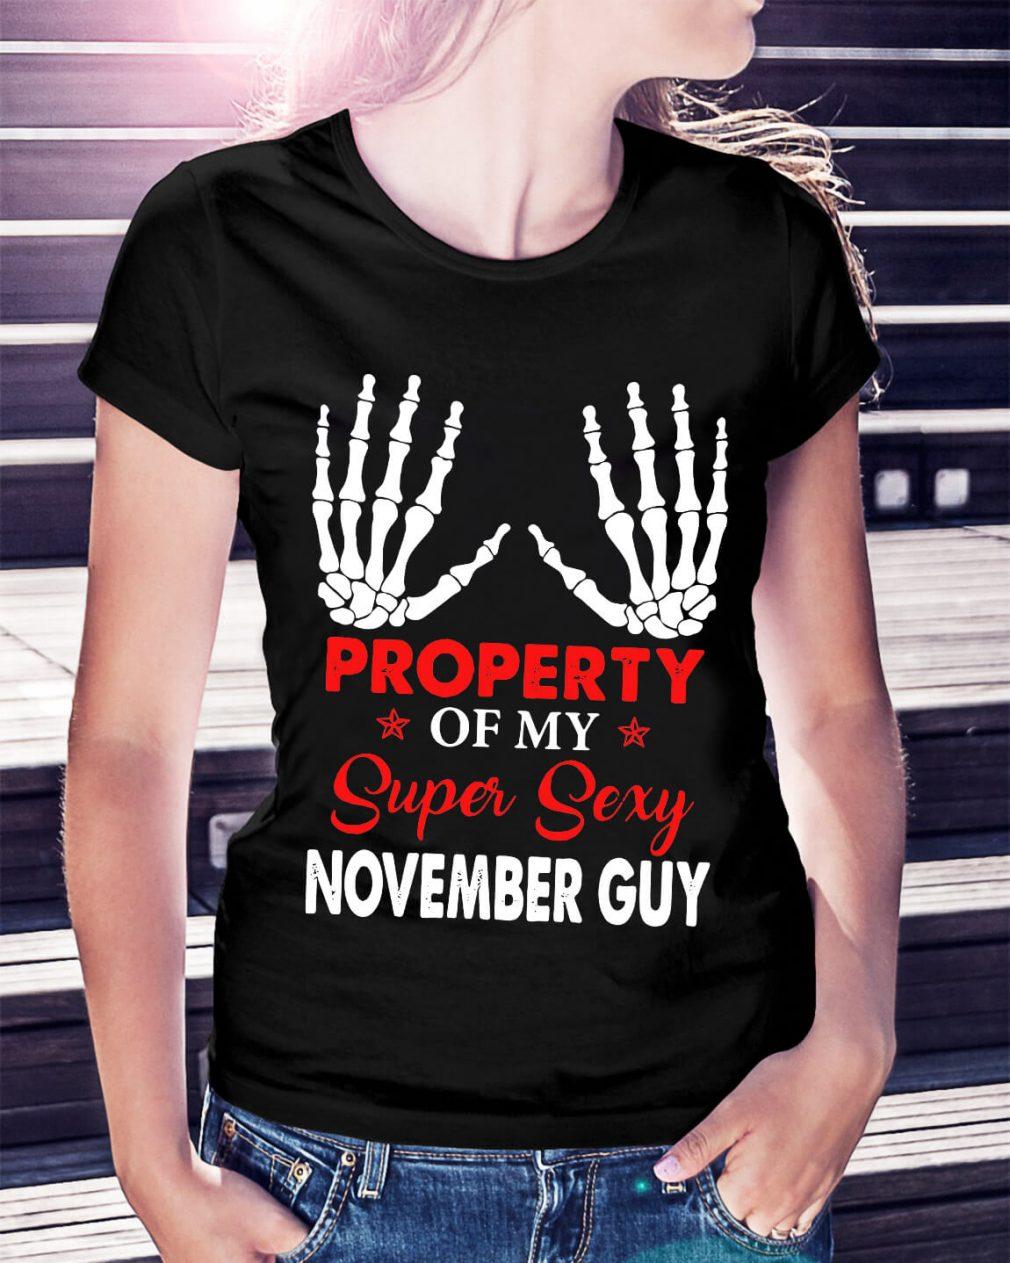 Property of my super sexy November guy shirt